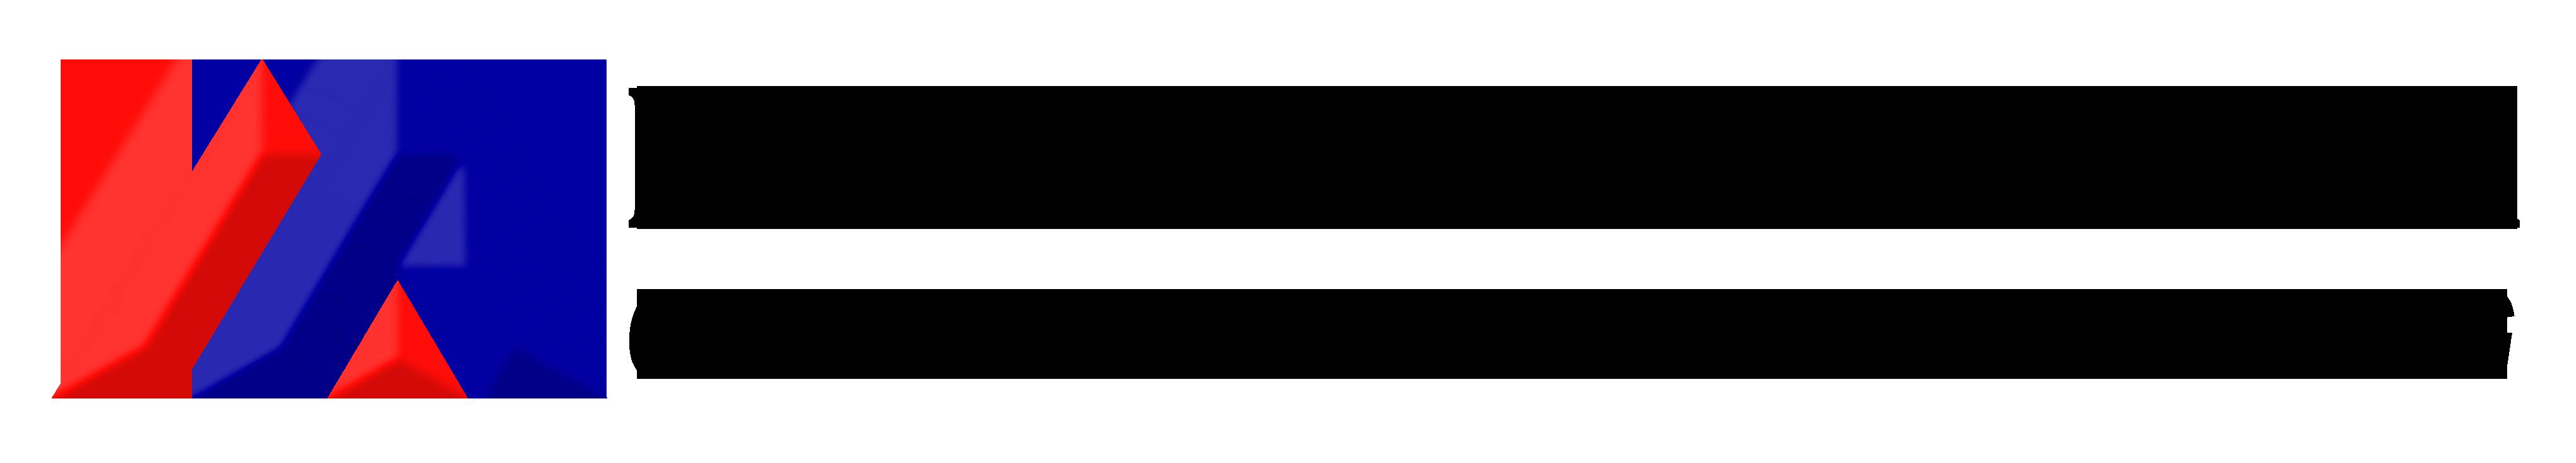 PT. Multikarya Saranaperkasa Logo